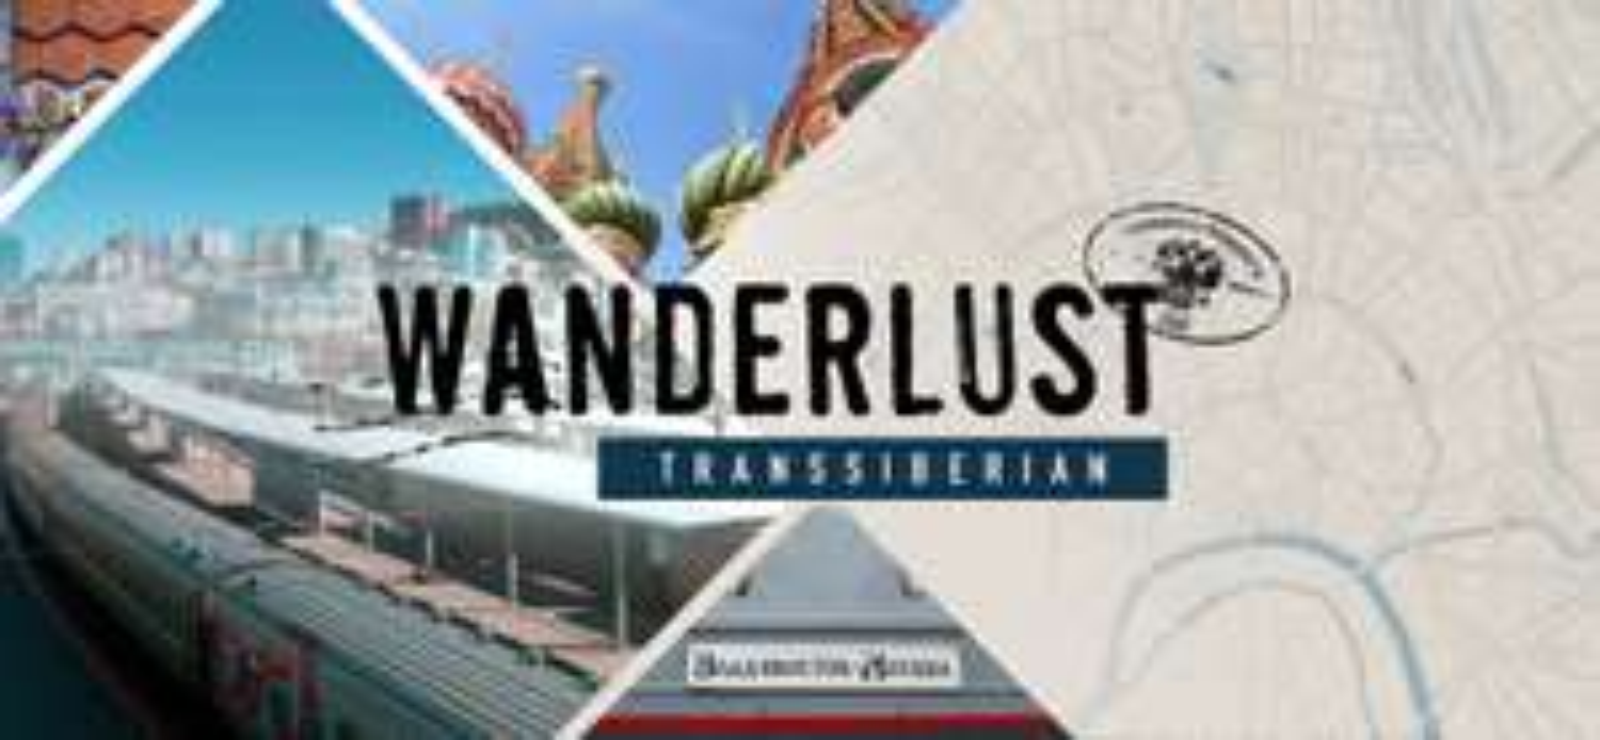 Wanderlust: Transsiberian @ GOG.com